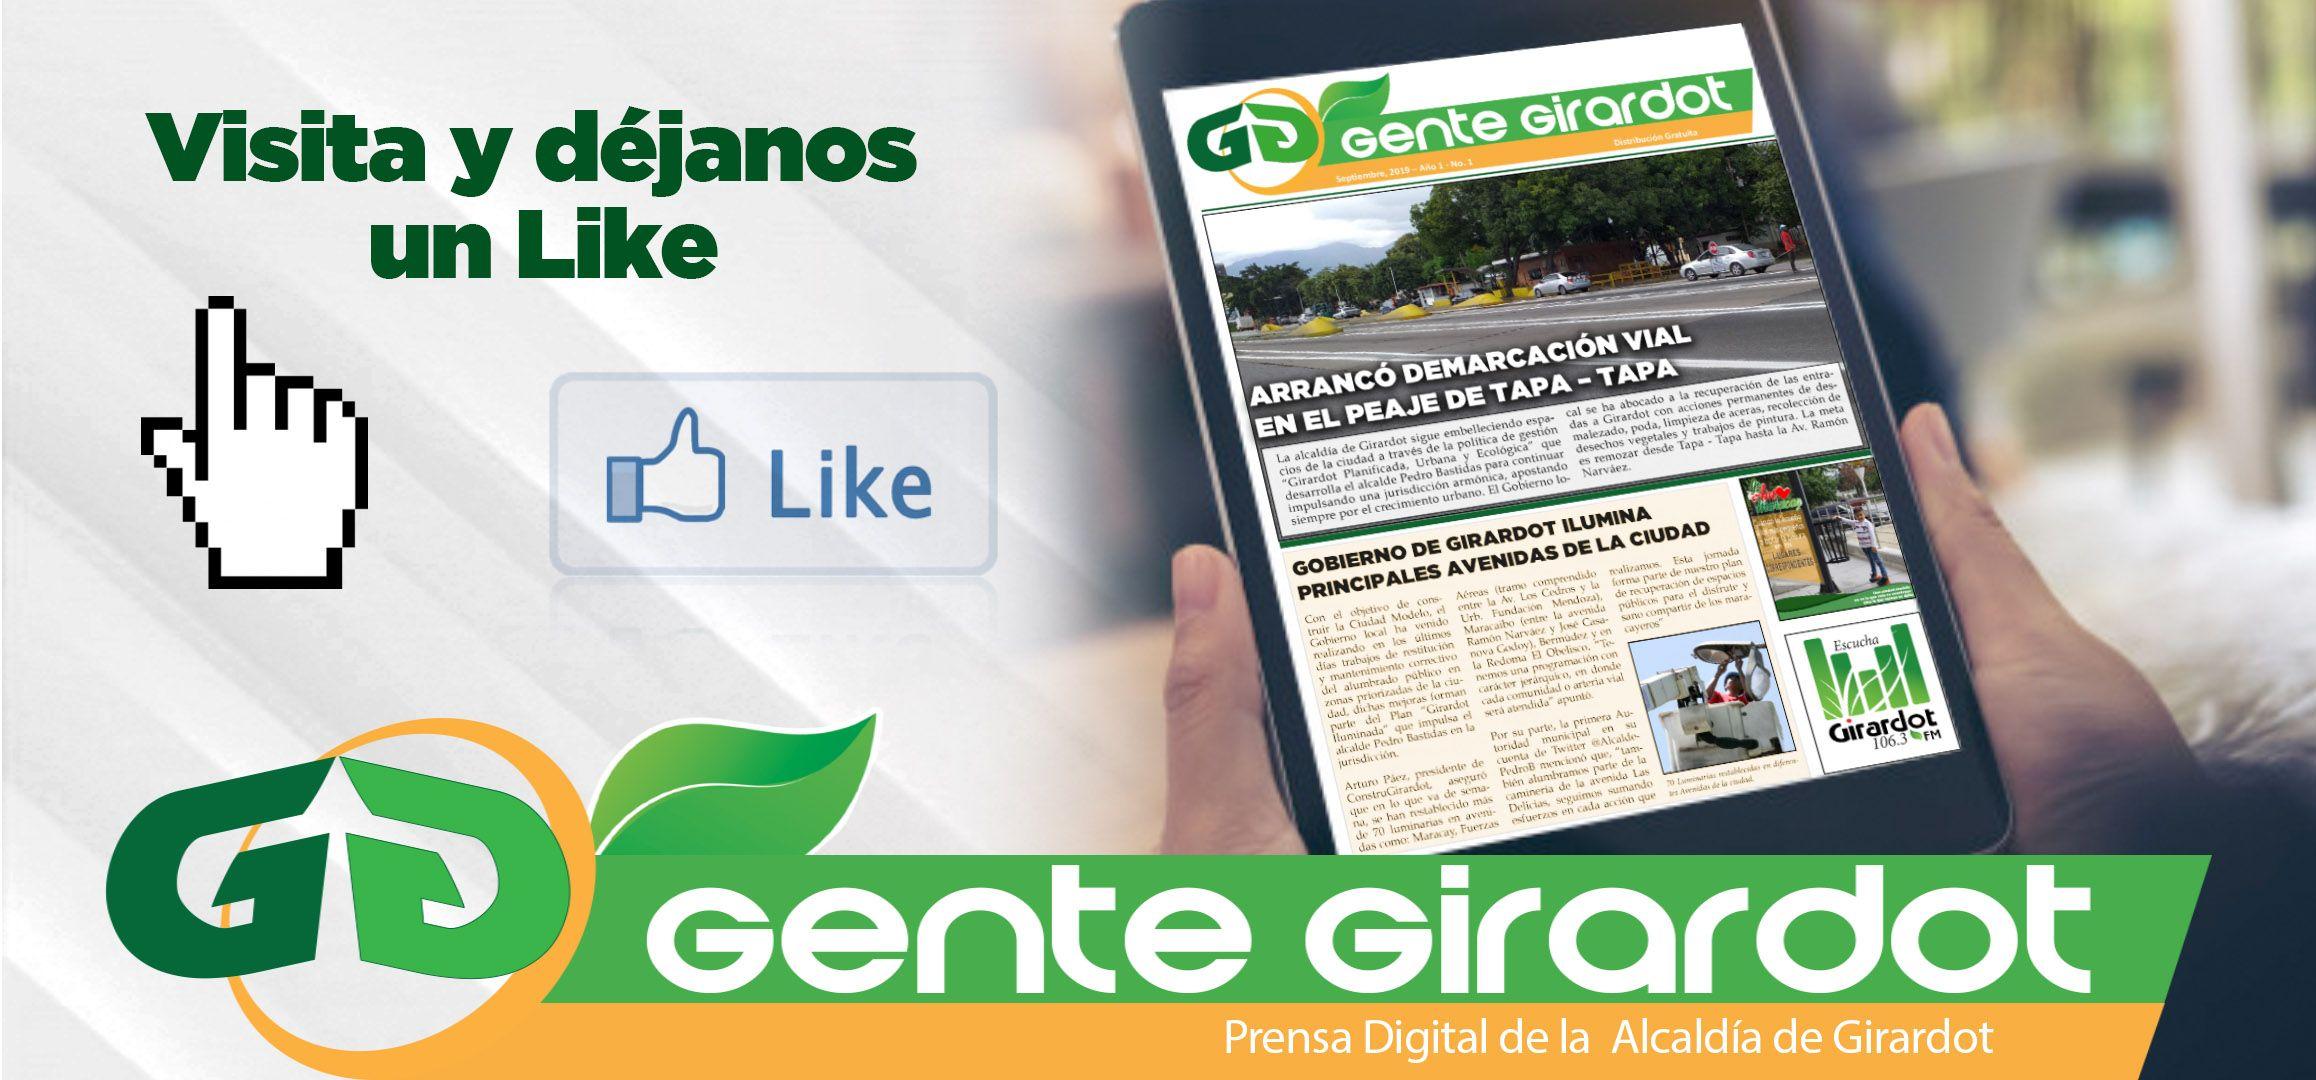 webGenteGirardot-cv3